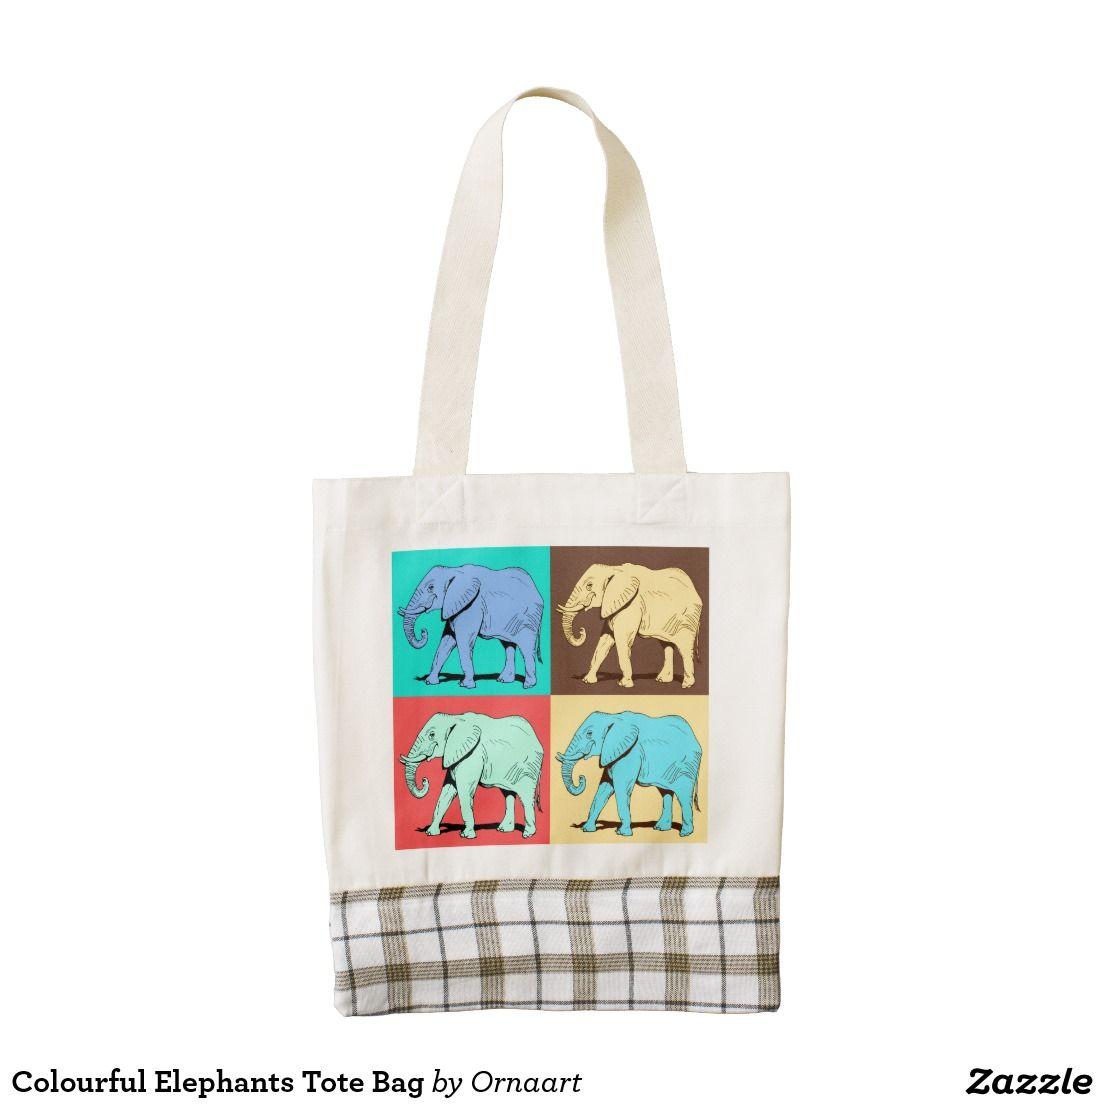 Colourful Elephants Tote Bag Zazzle HEART Tote Bag